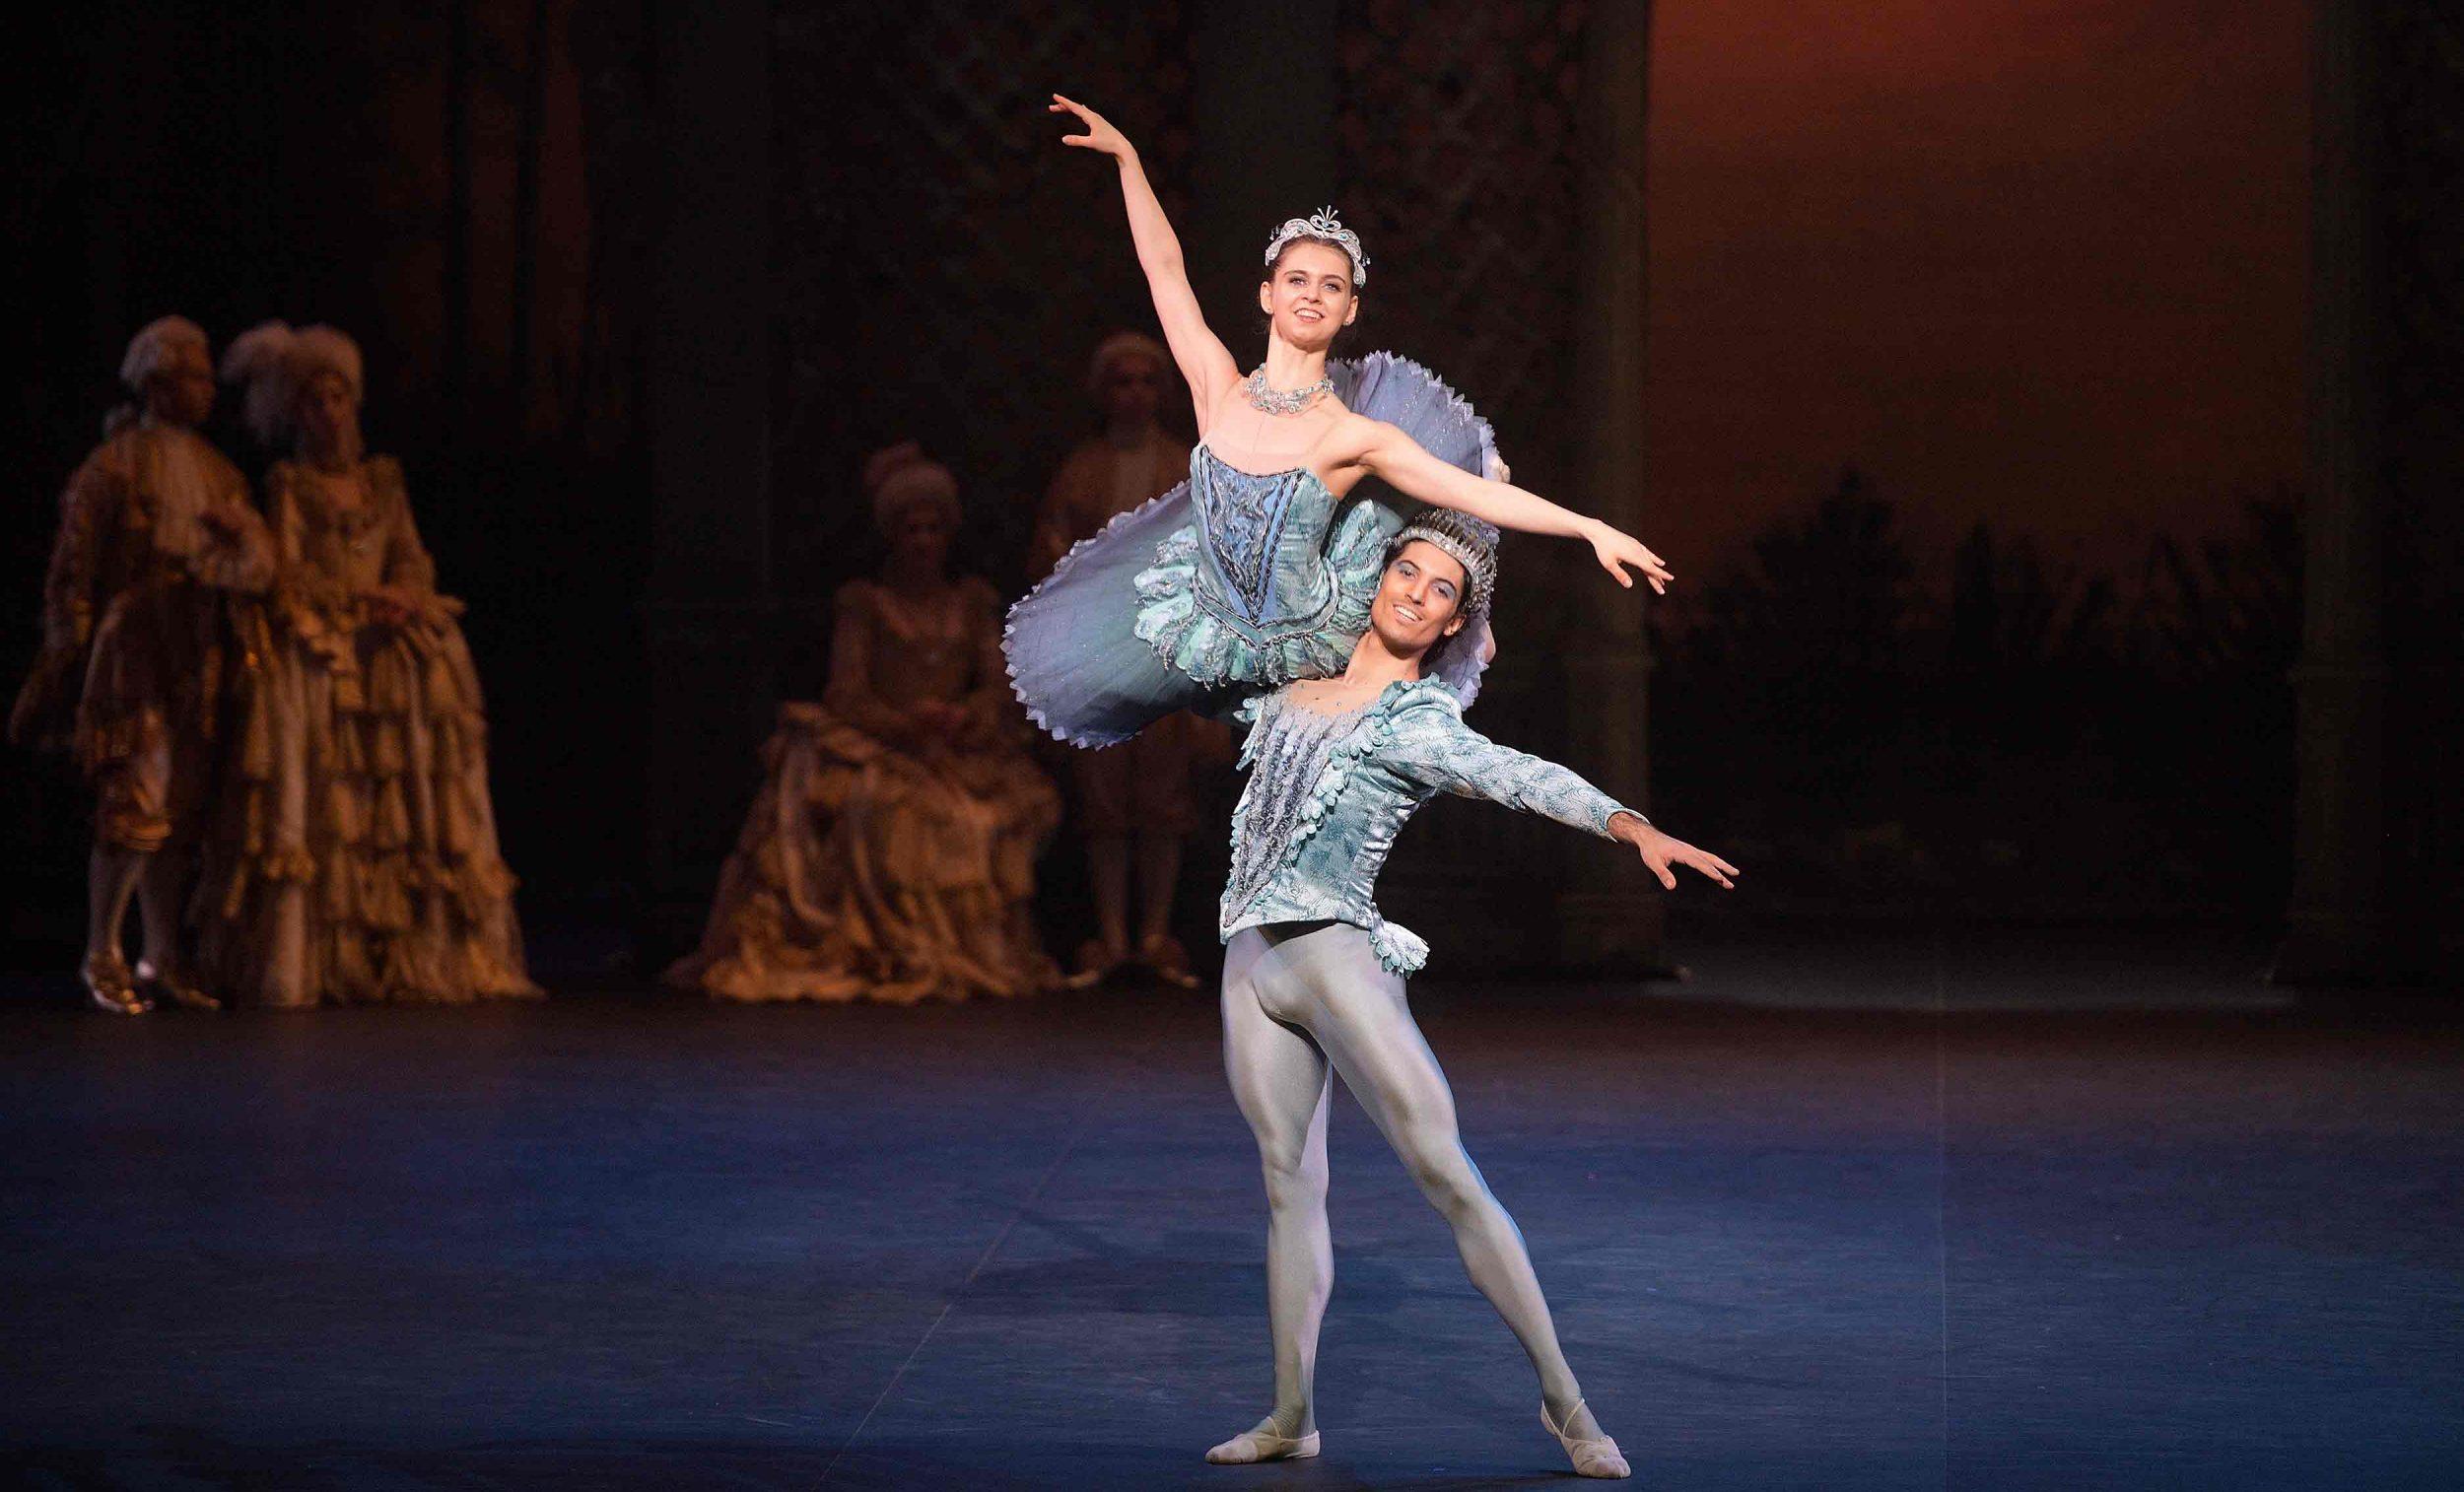 Fernando-Carratalá-Coloma-as-the-Bluebird-and-Julia-Conway-as-Princess-Florine-in-The-Sleeping-Beauty-©-Laurent-Liotardo_WEB